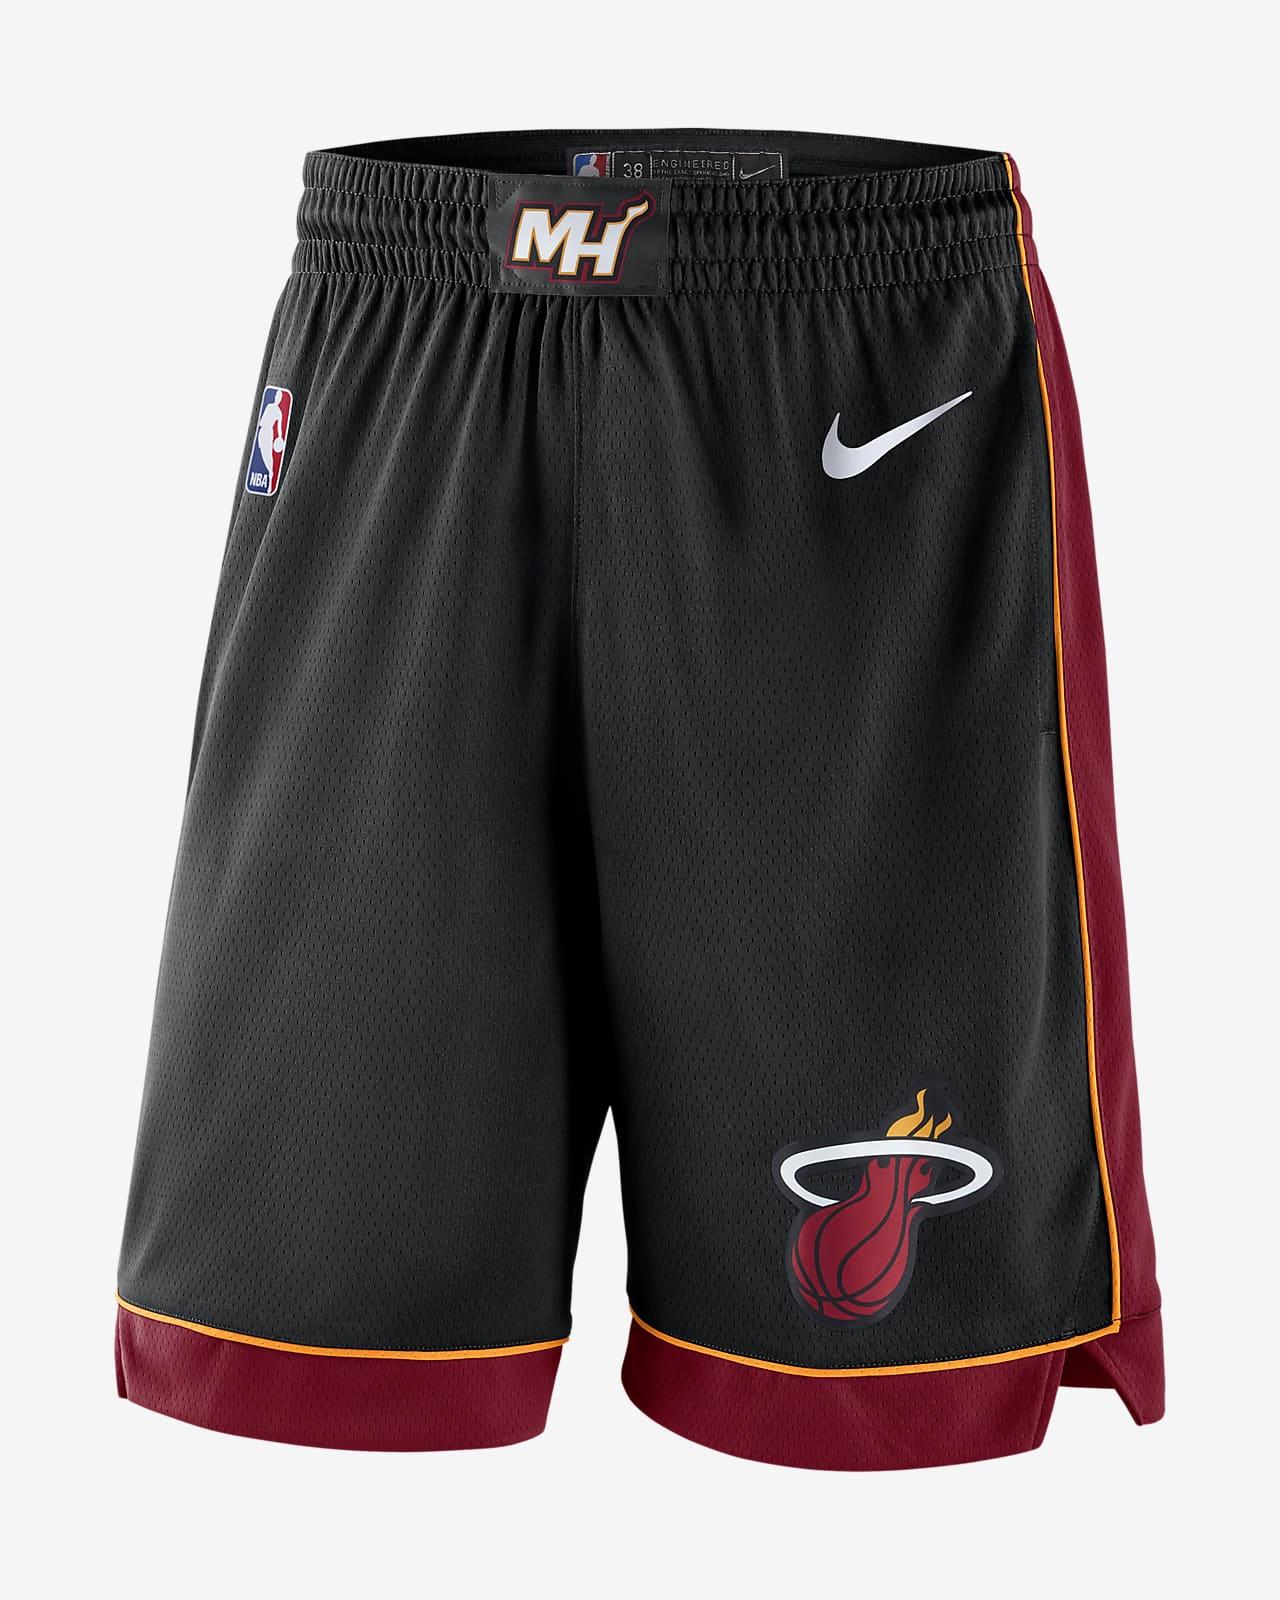 Miami Heat Icon Edition Nike NBA Swingman Shorts für Herren